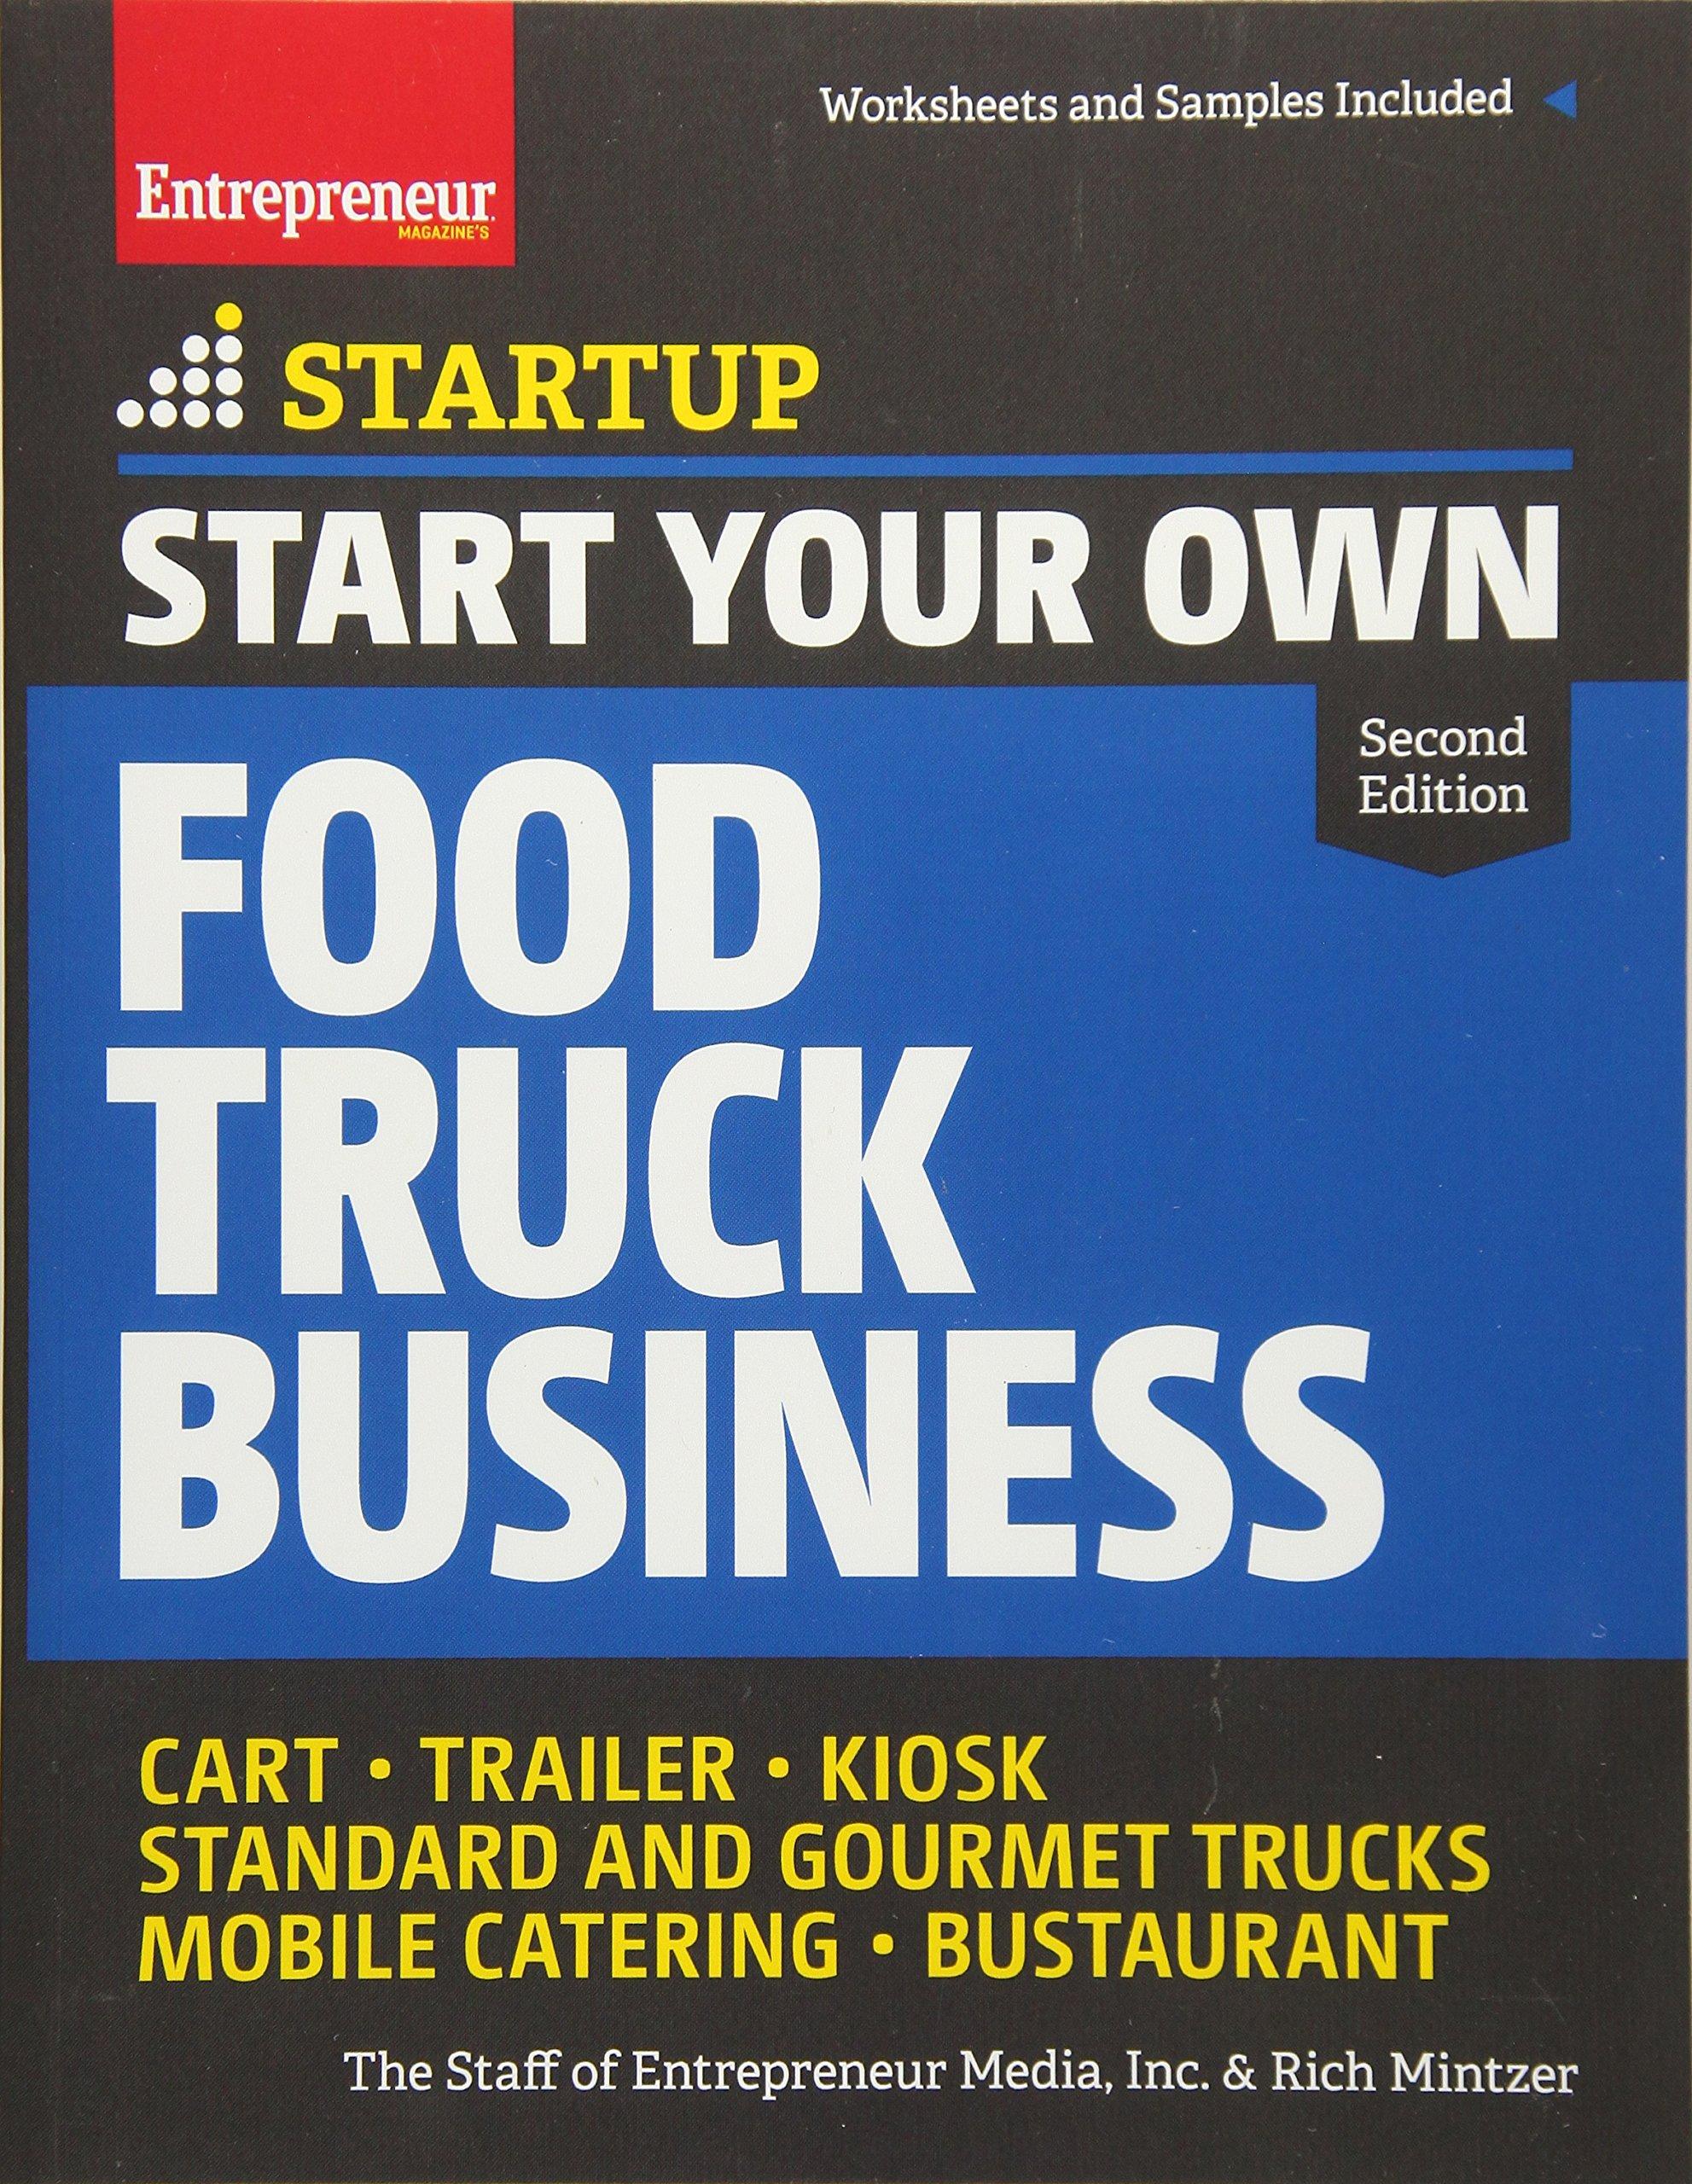 Start Your Own Food Truck Business: Cart • Trailer • Kiosk • Standard and Gourmet Trucks • Mobile Catering • Bustaurant (StartUp Series)